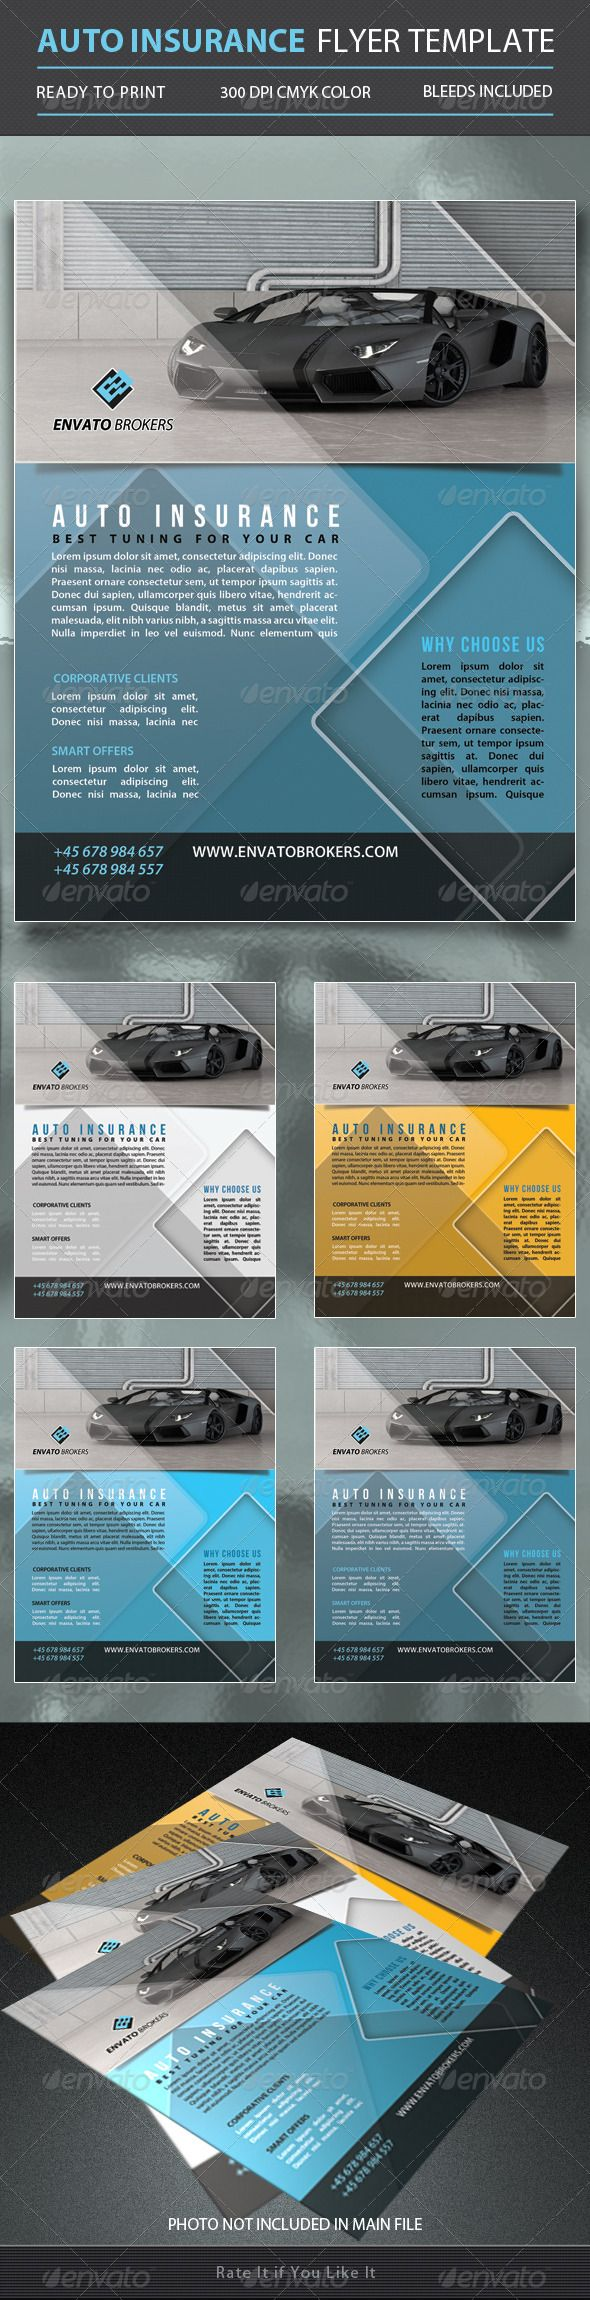 Auto Insurance Flyer Template Car Insurance Flyer Template Flyer